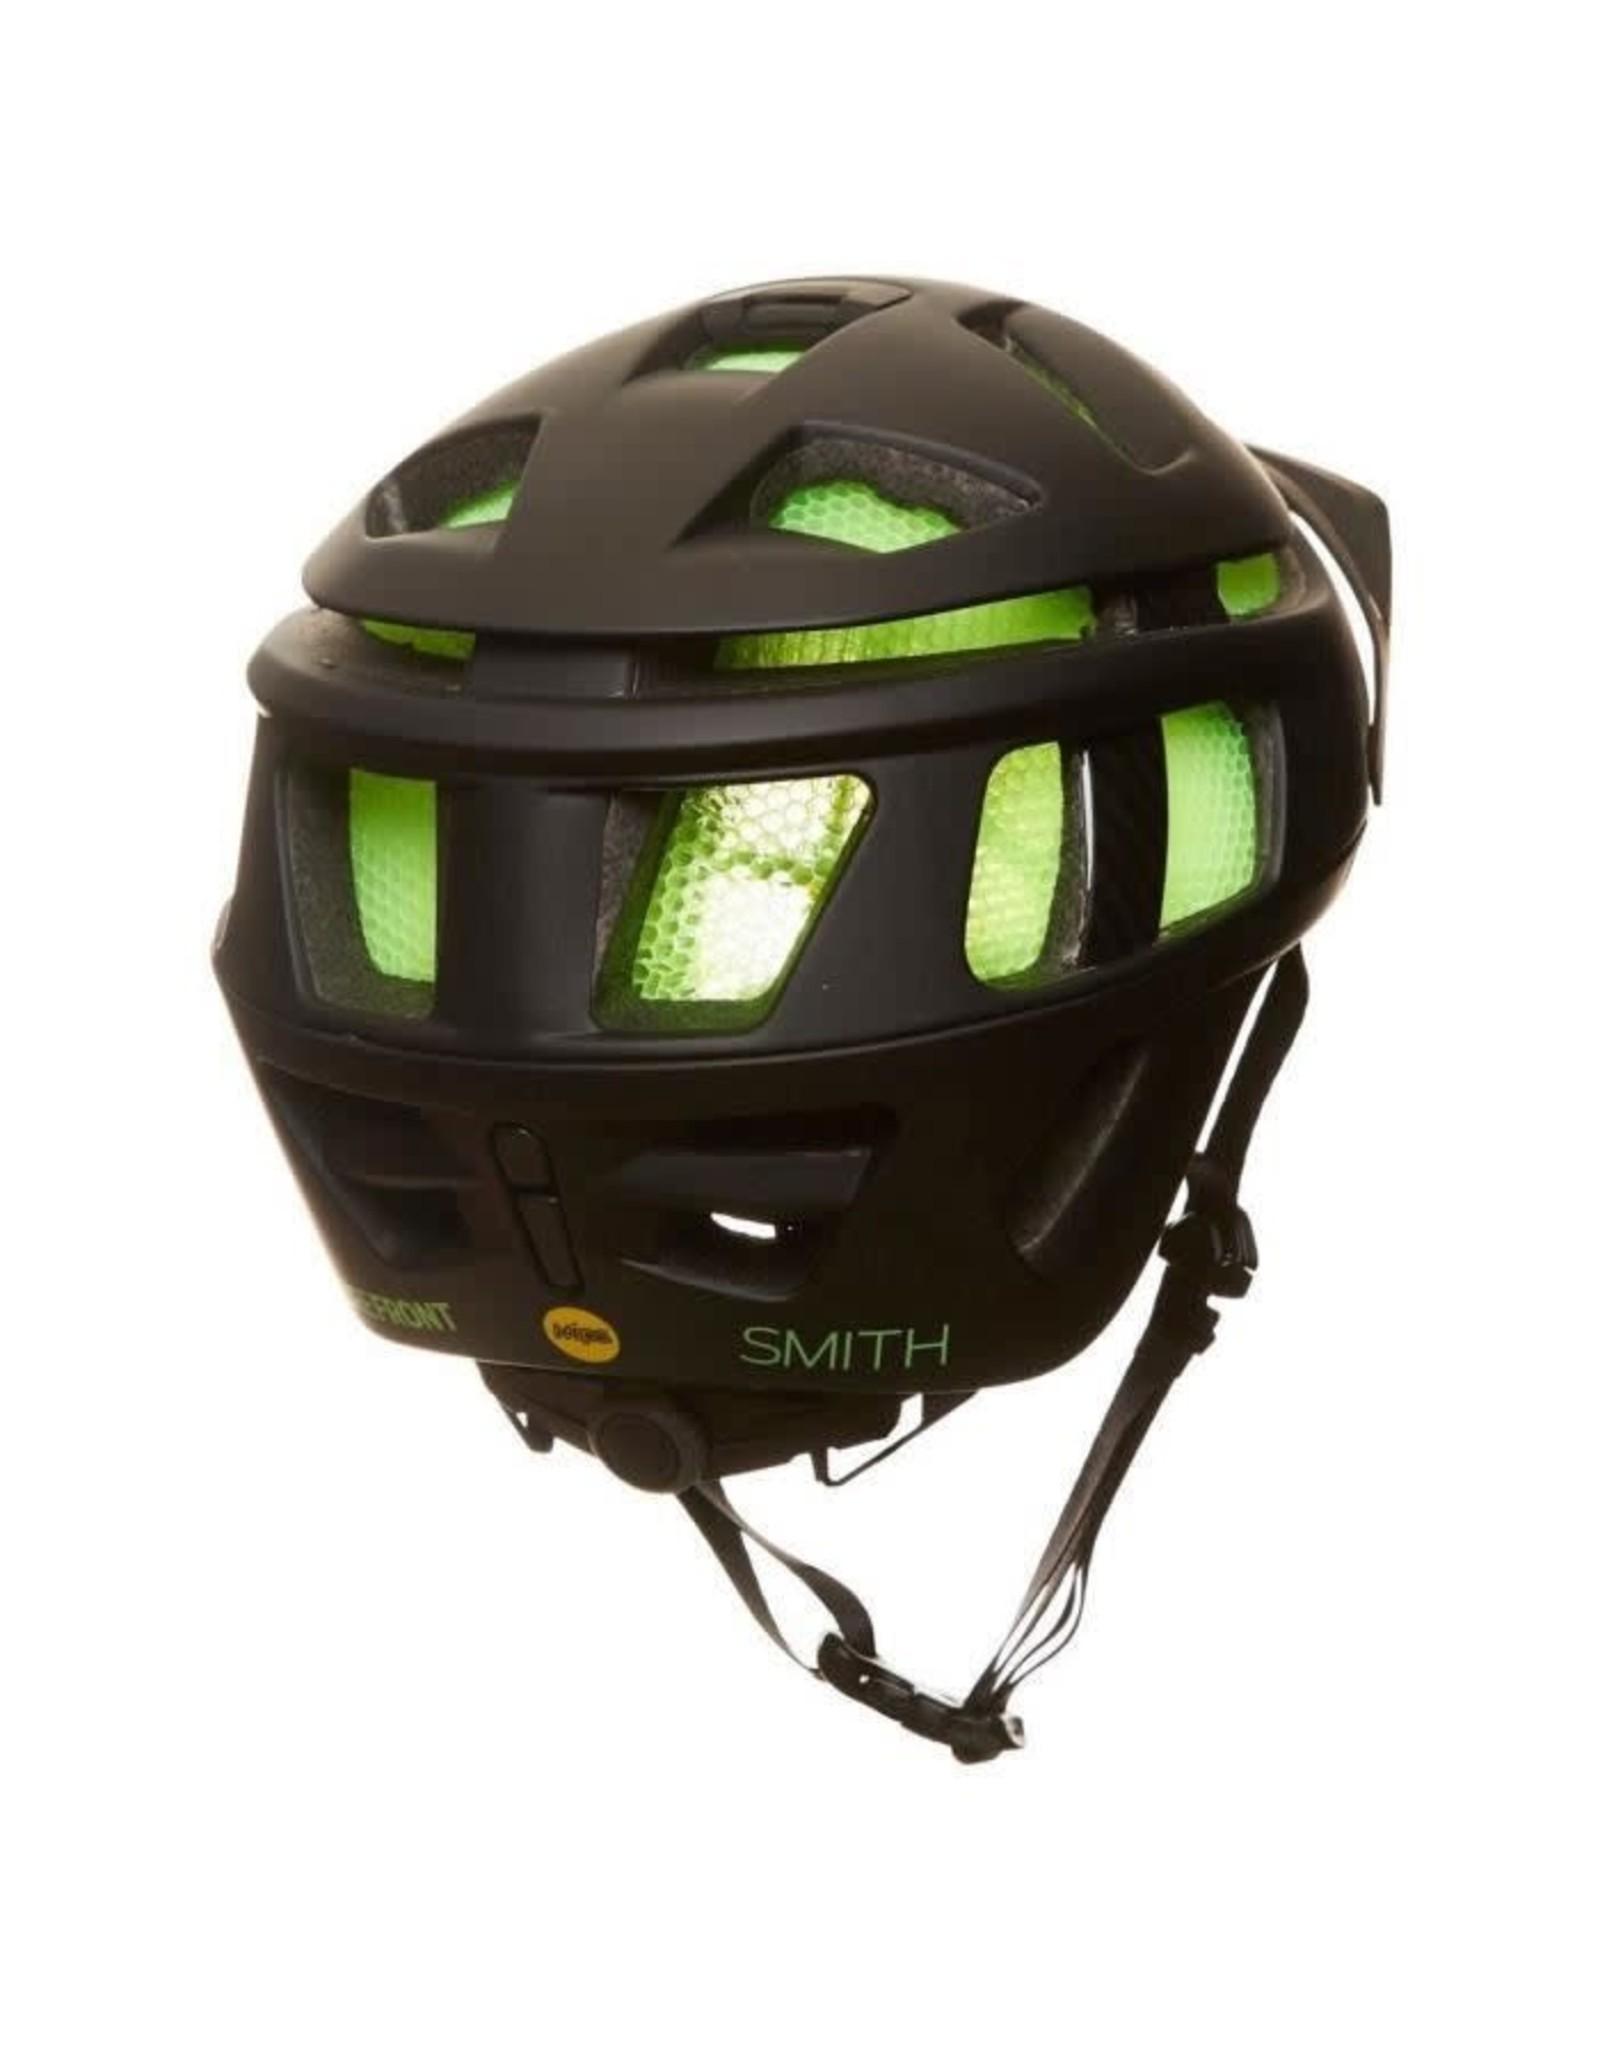 Smith Optics Forefront Helmet: Medium/Matte Black